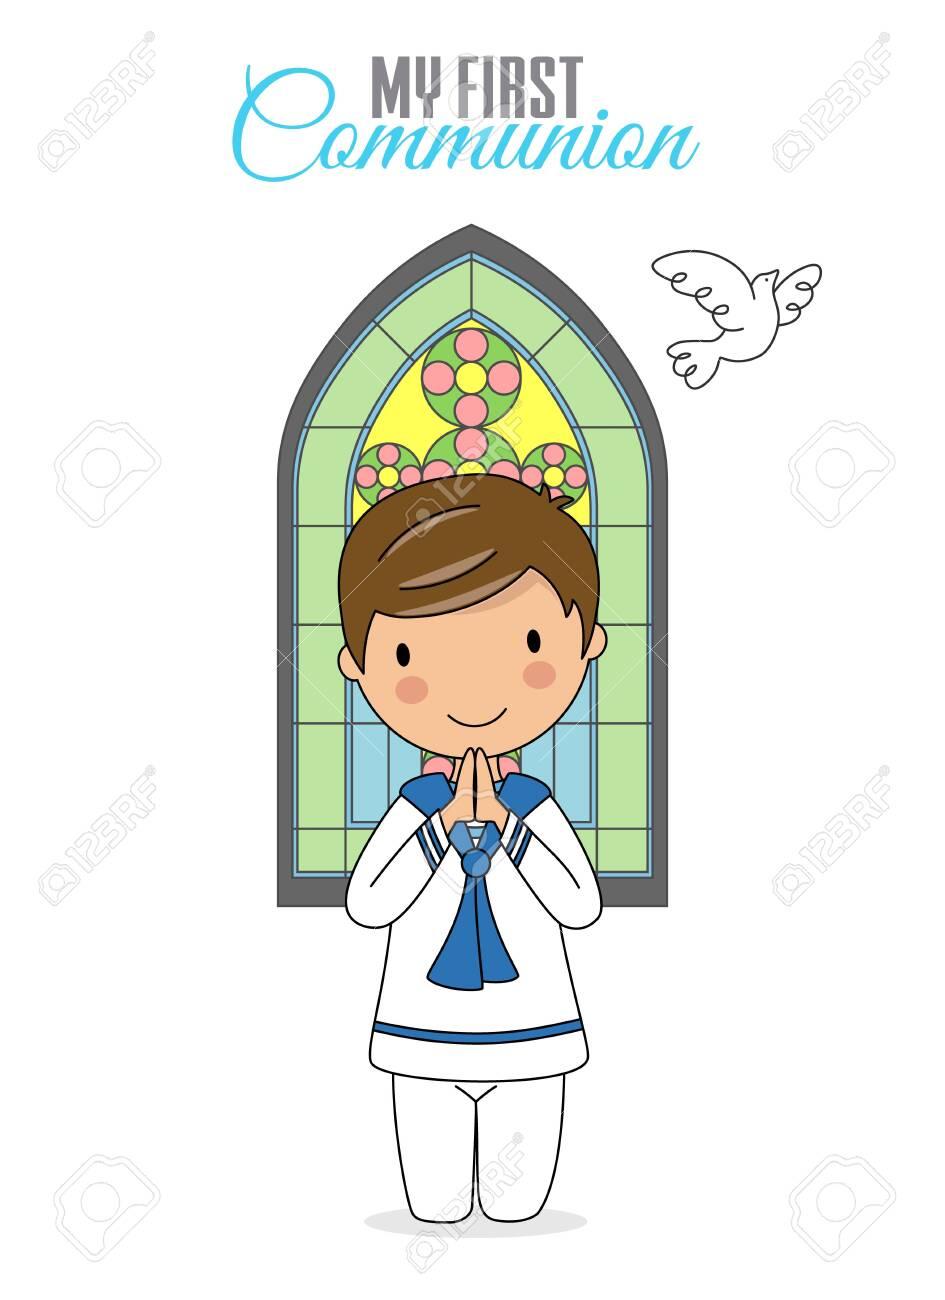 Invitation my first communion. Boy praying with church window behind - 129950065